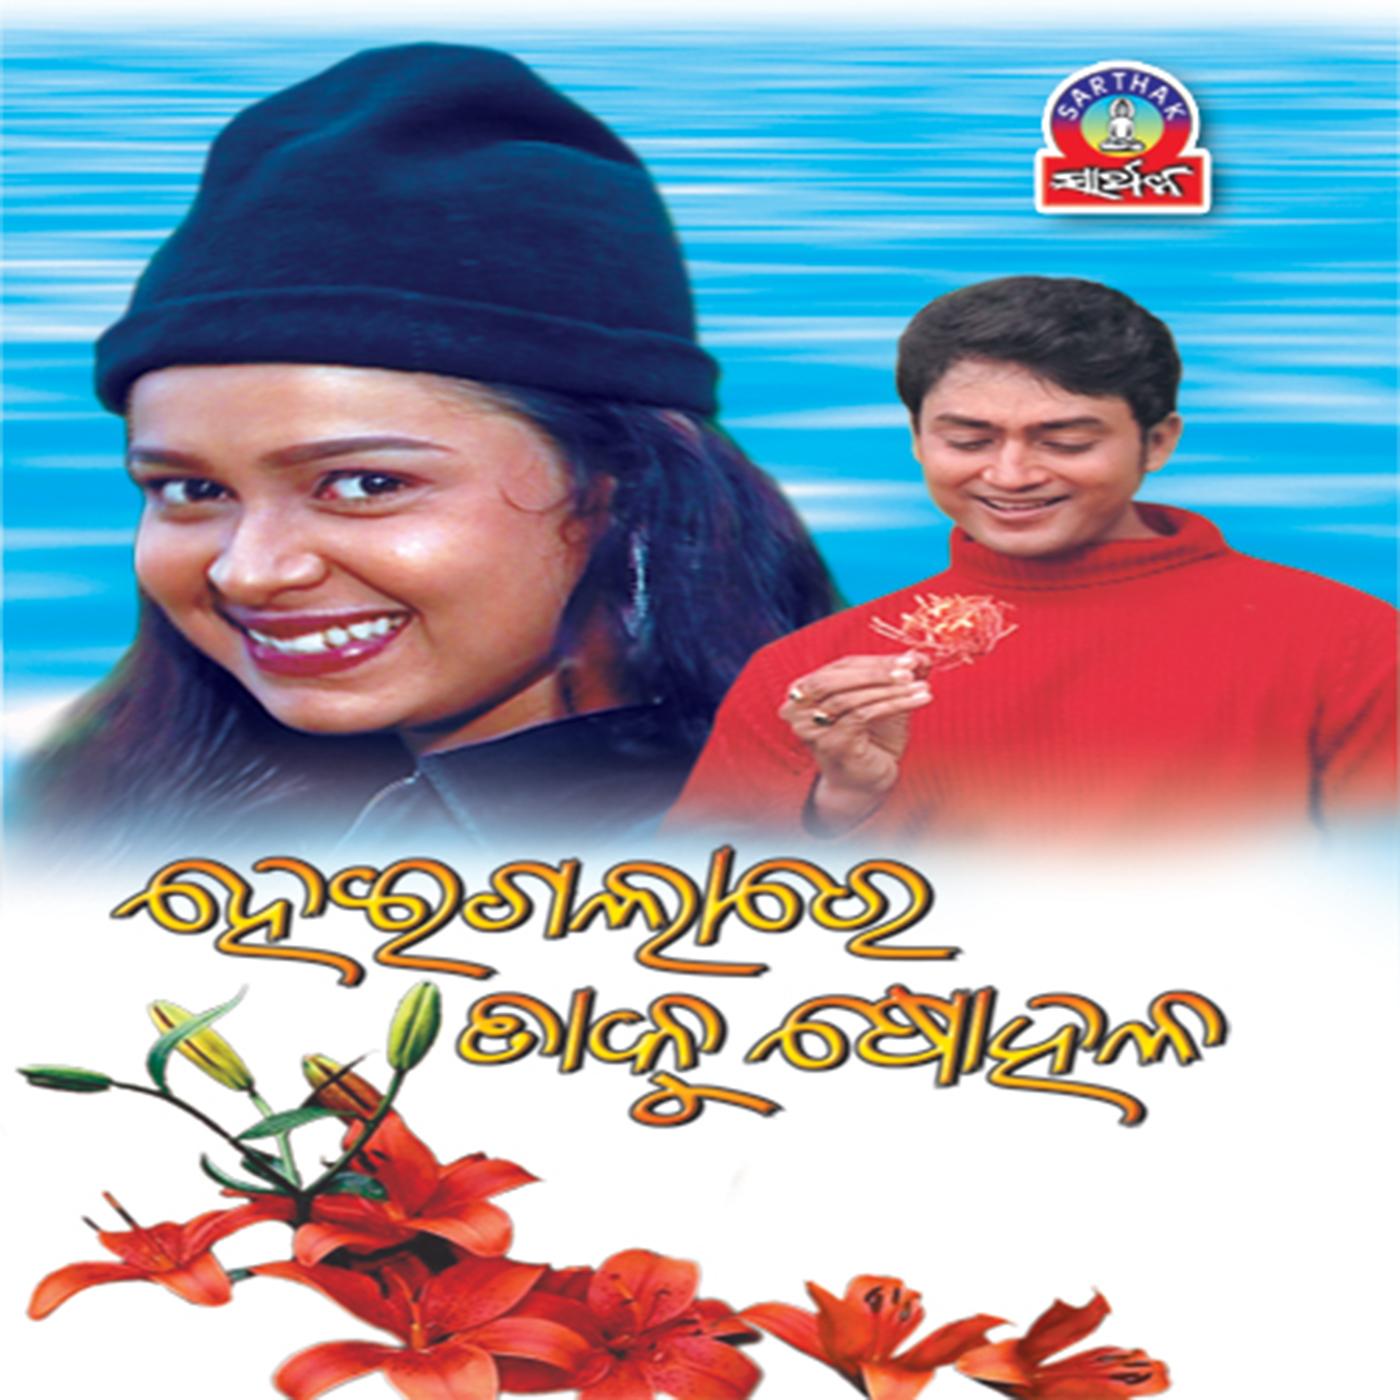 Tame Kichi Bhabi Thiba (Rashmi Mohapatra)